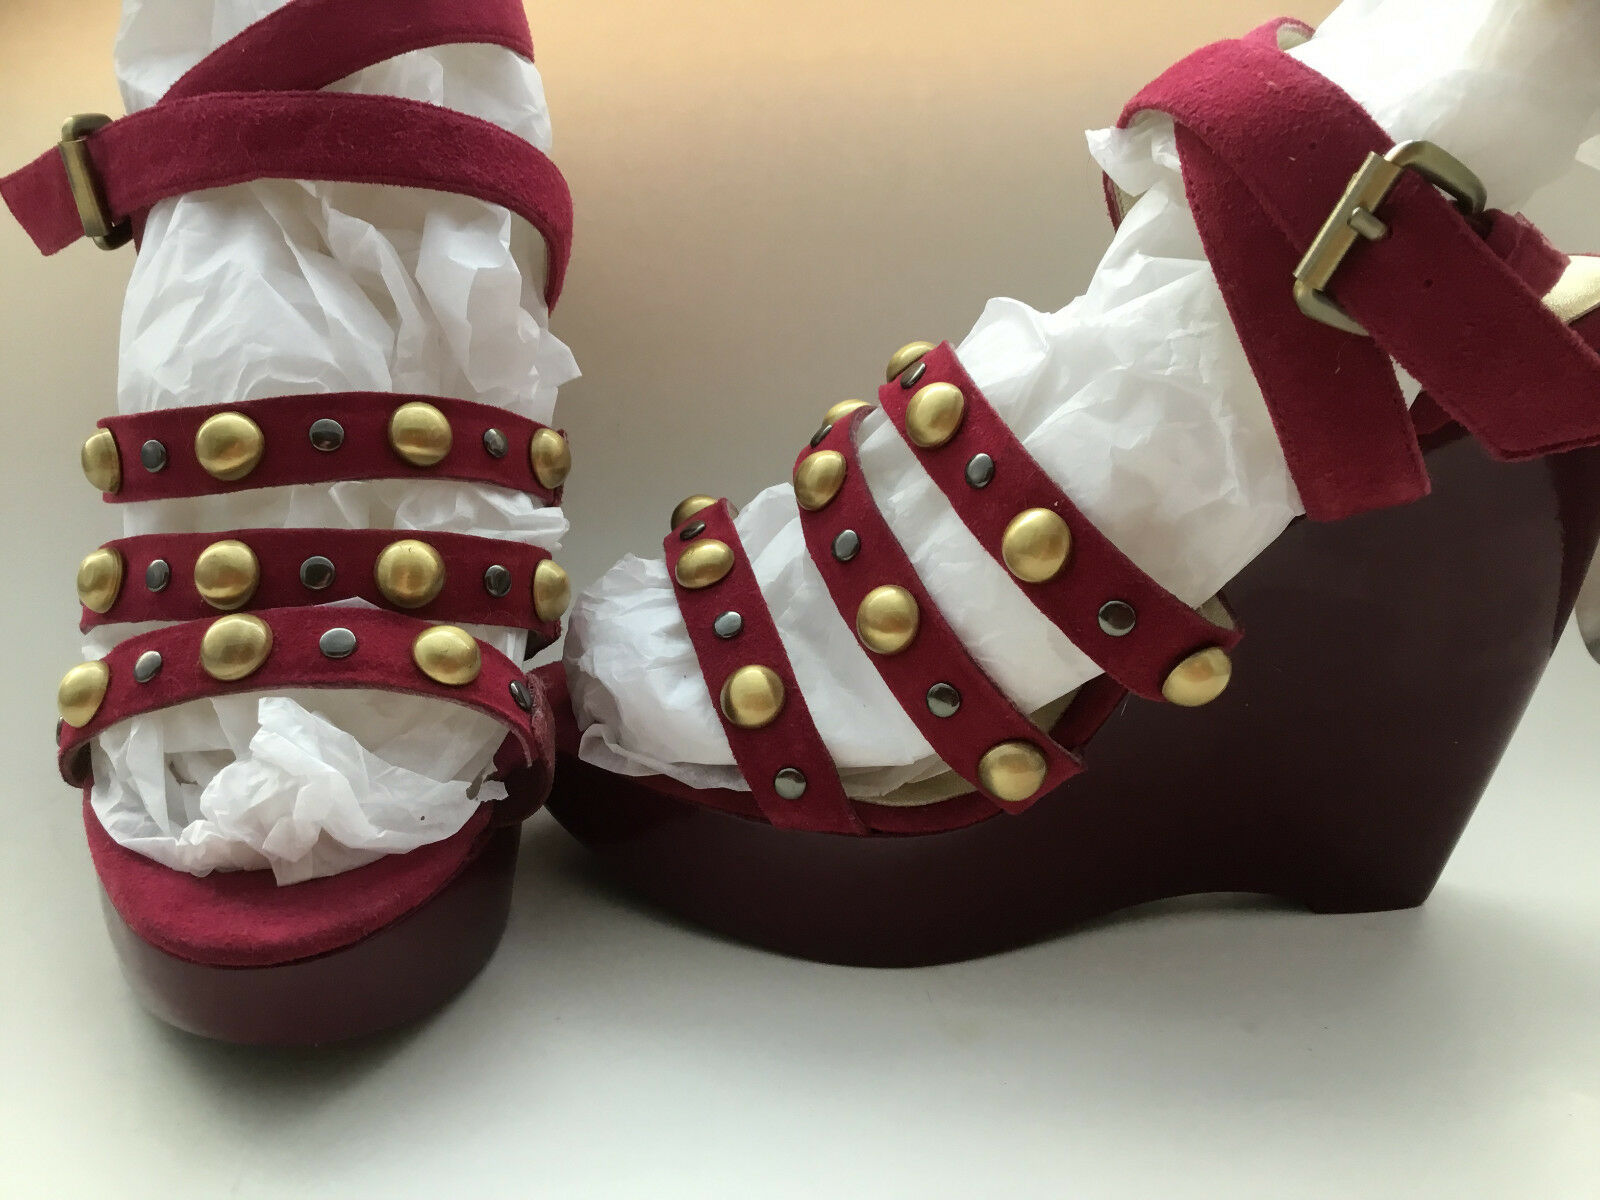 Pelle Moda Size 6.5WW Bordo Wedge Platform Sandals New Womens shoes